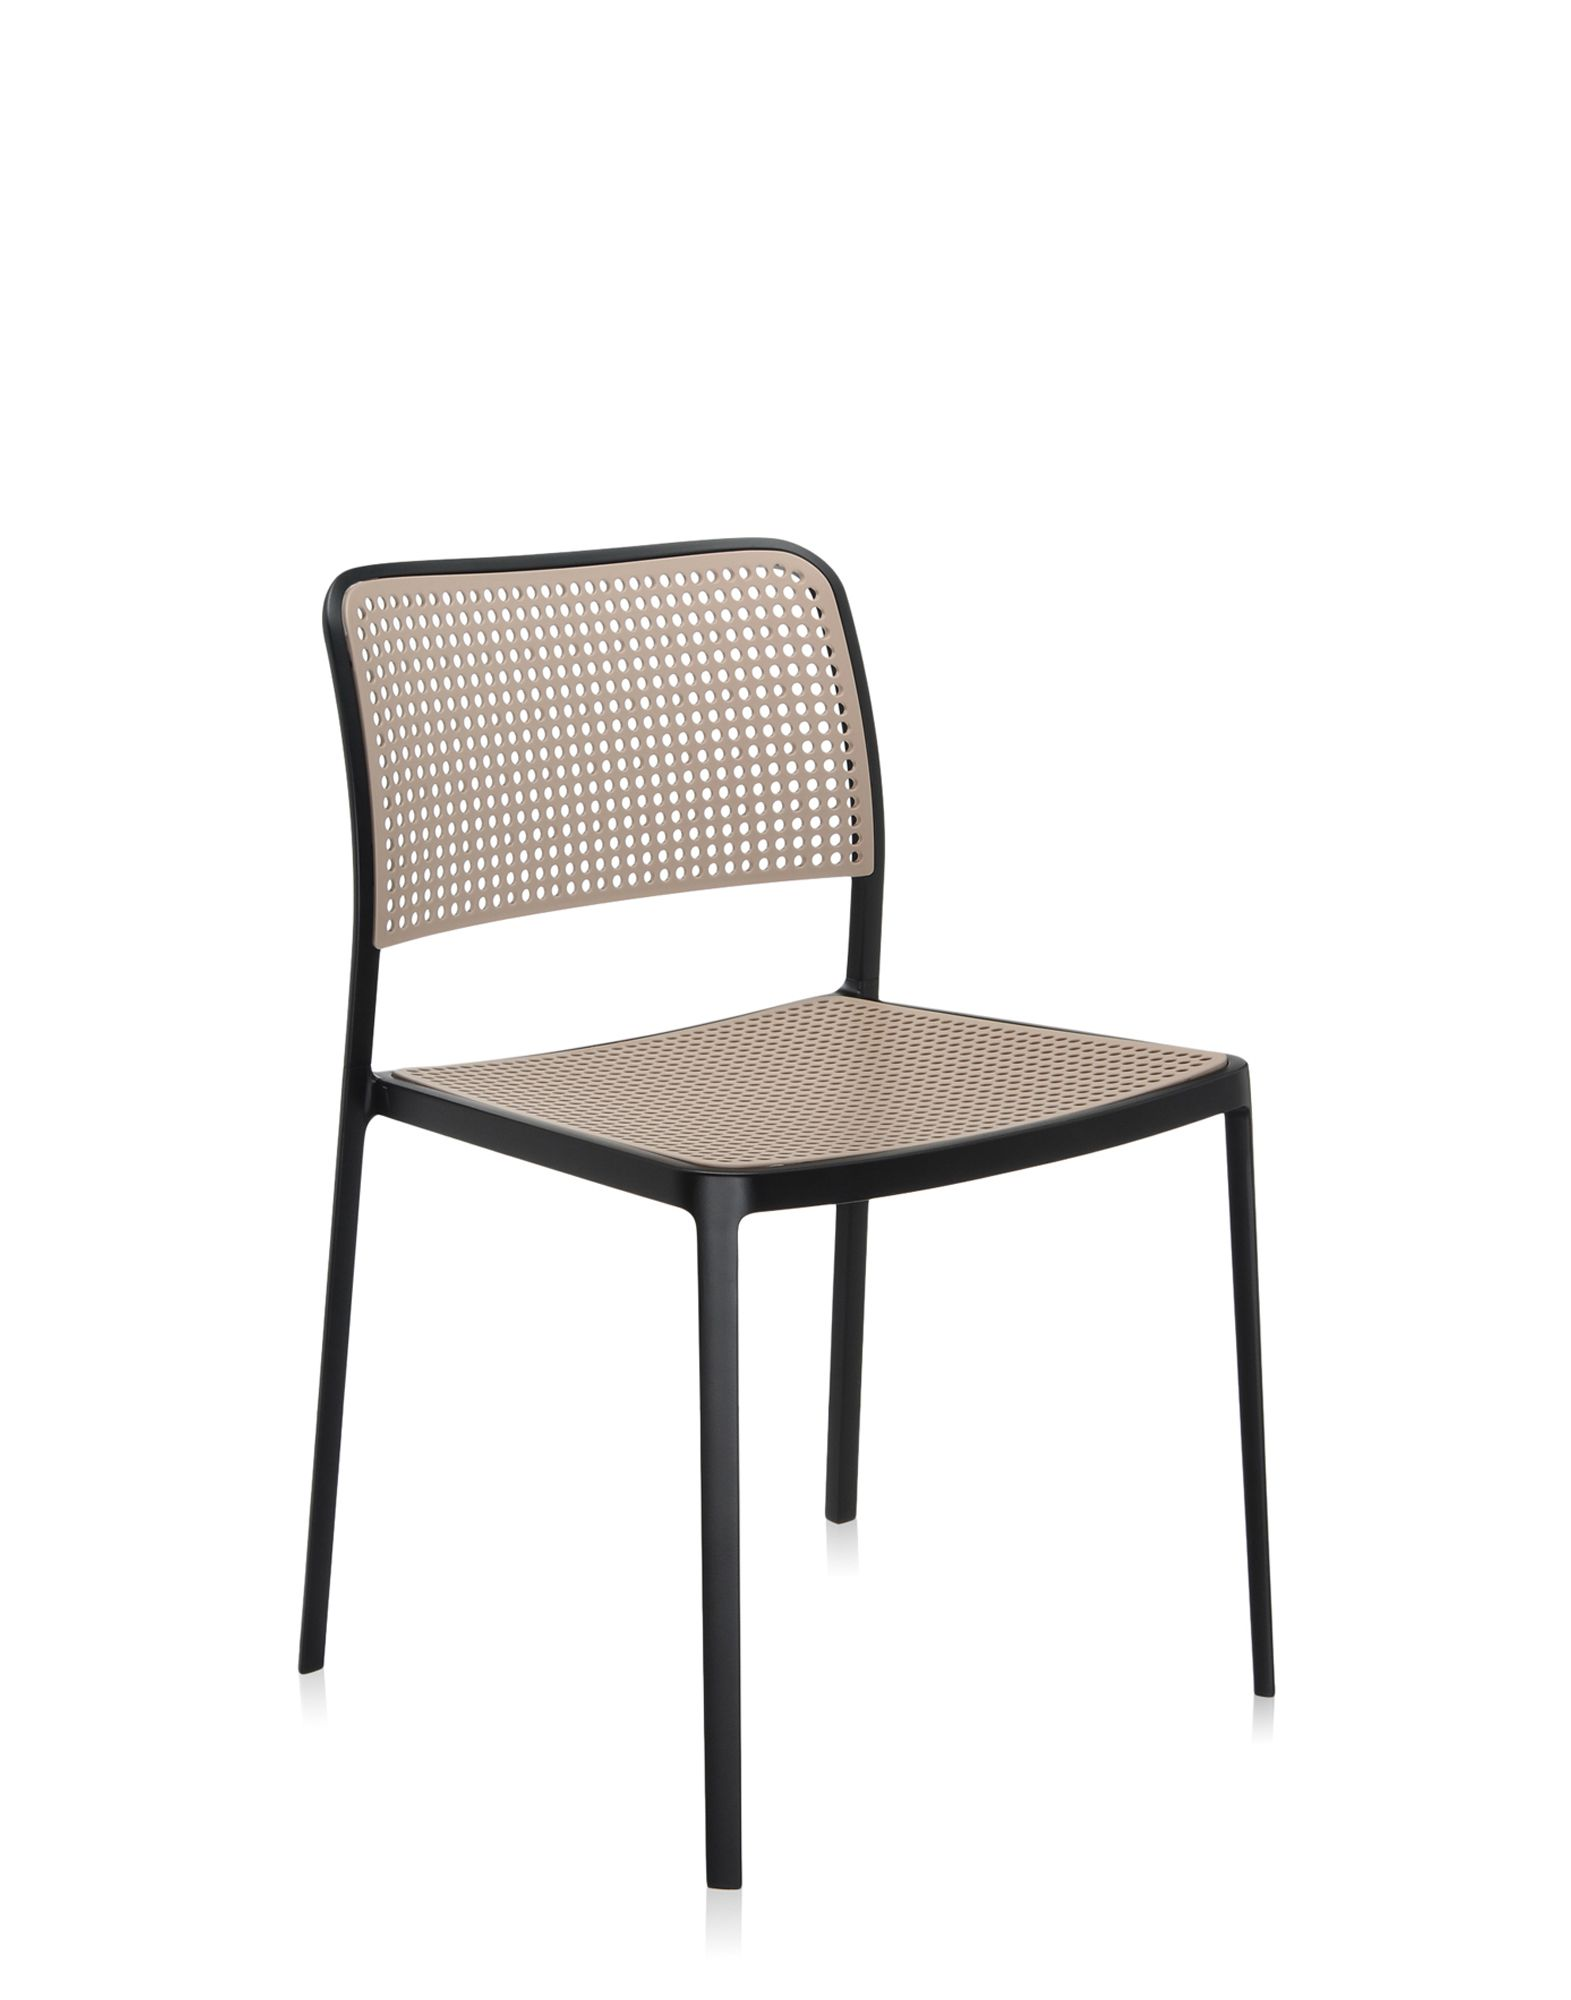 Kartell audrey sabbia alluminio verniciato nero sedie for Sedie alluminio design